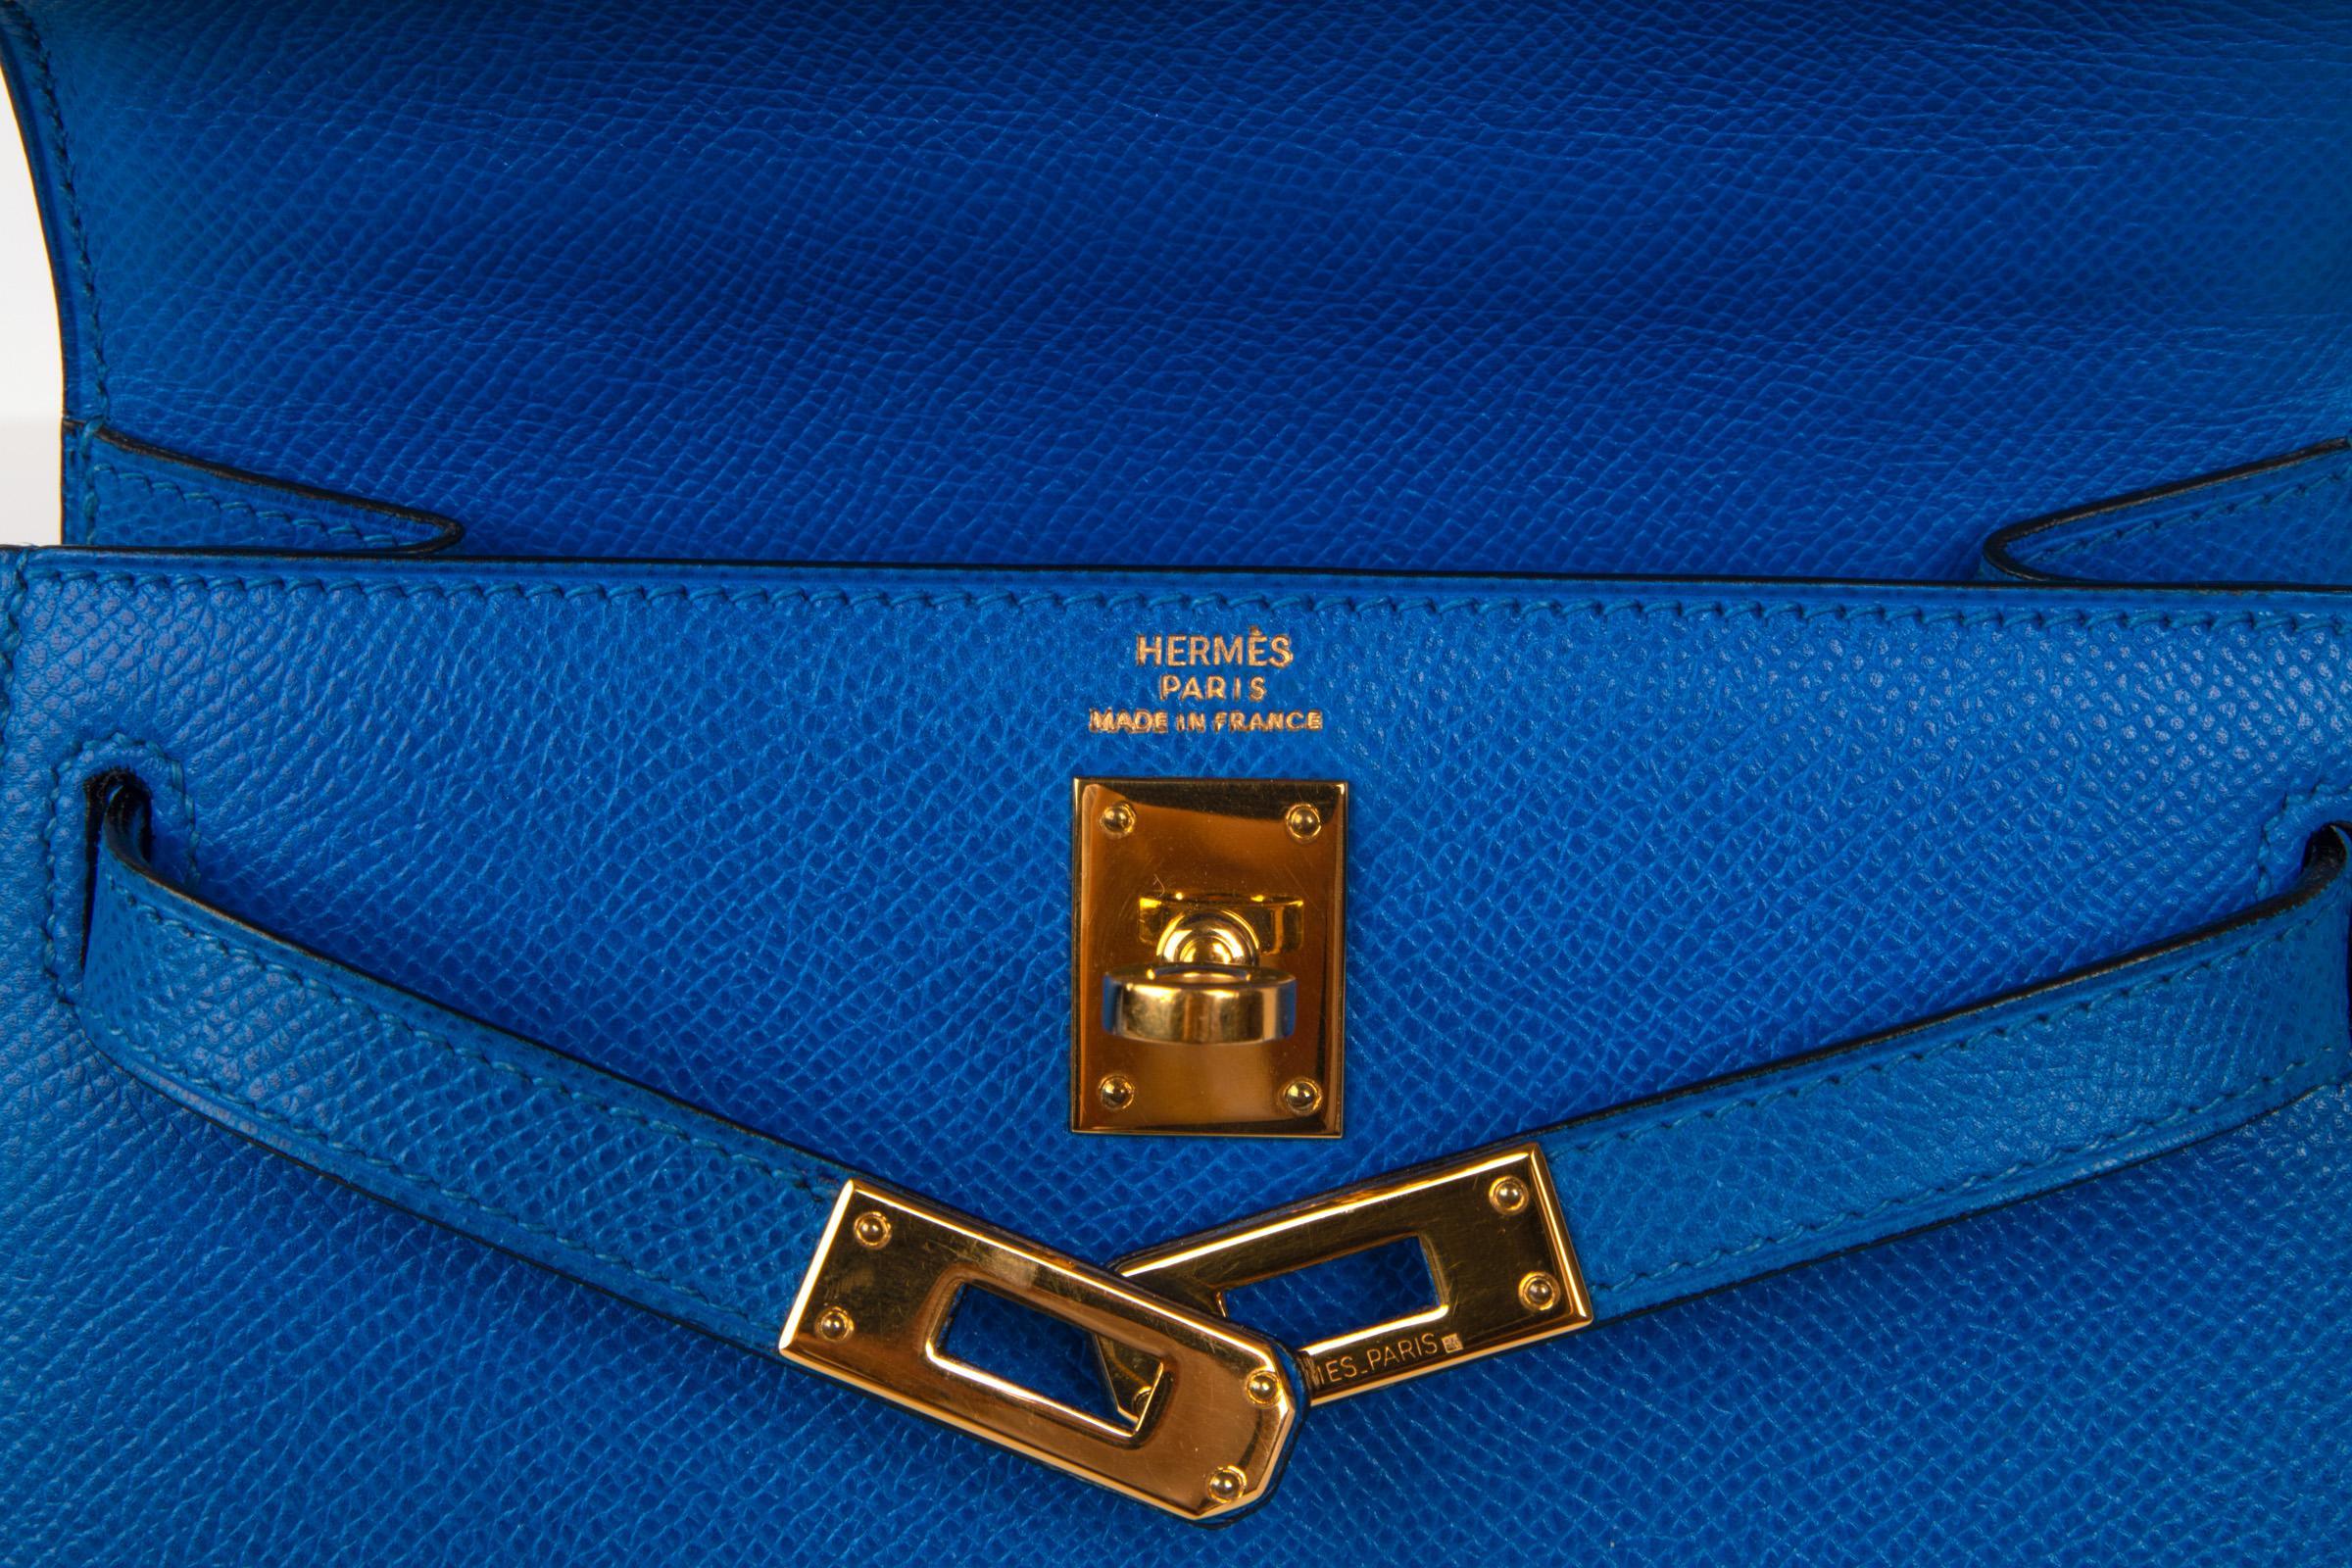 98fbaec9db12 Hermes Vintage Kelly 20 Sellier Mini Blue de France Courchevel Gold  Hardware at 1stdibs